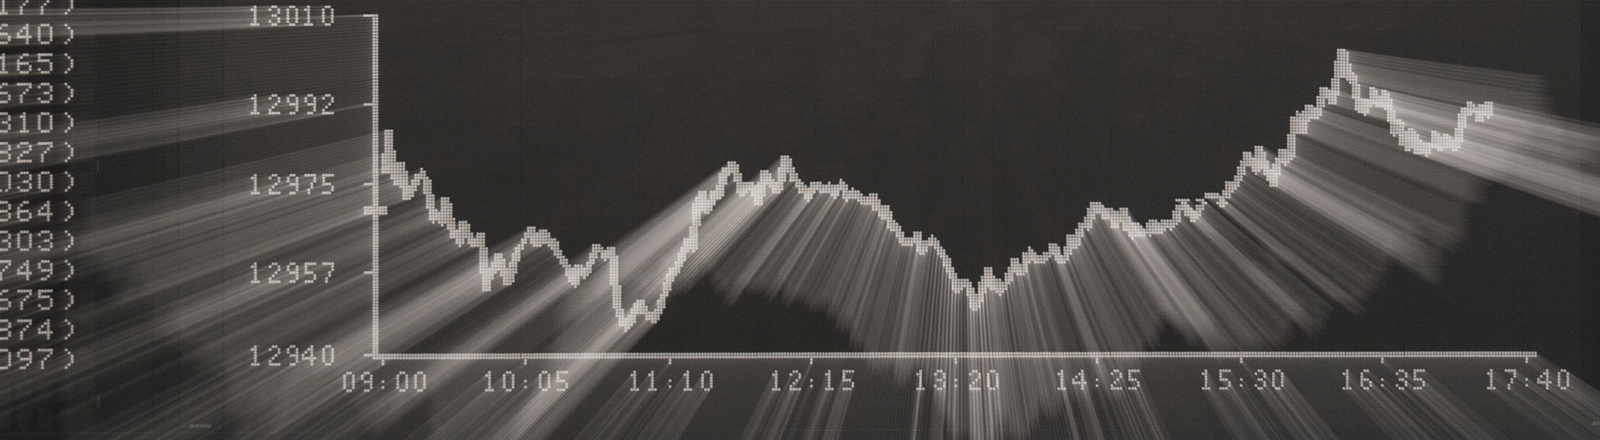 Börsen-Tafel mit Dax-Kurve